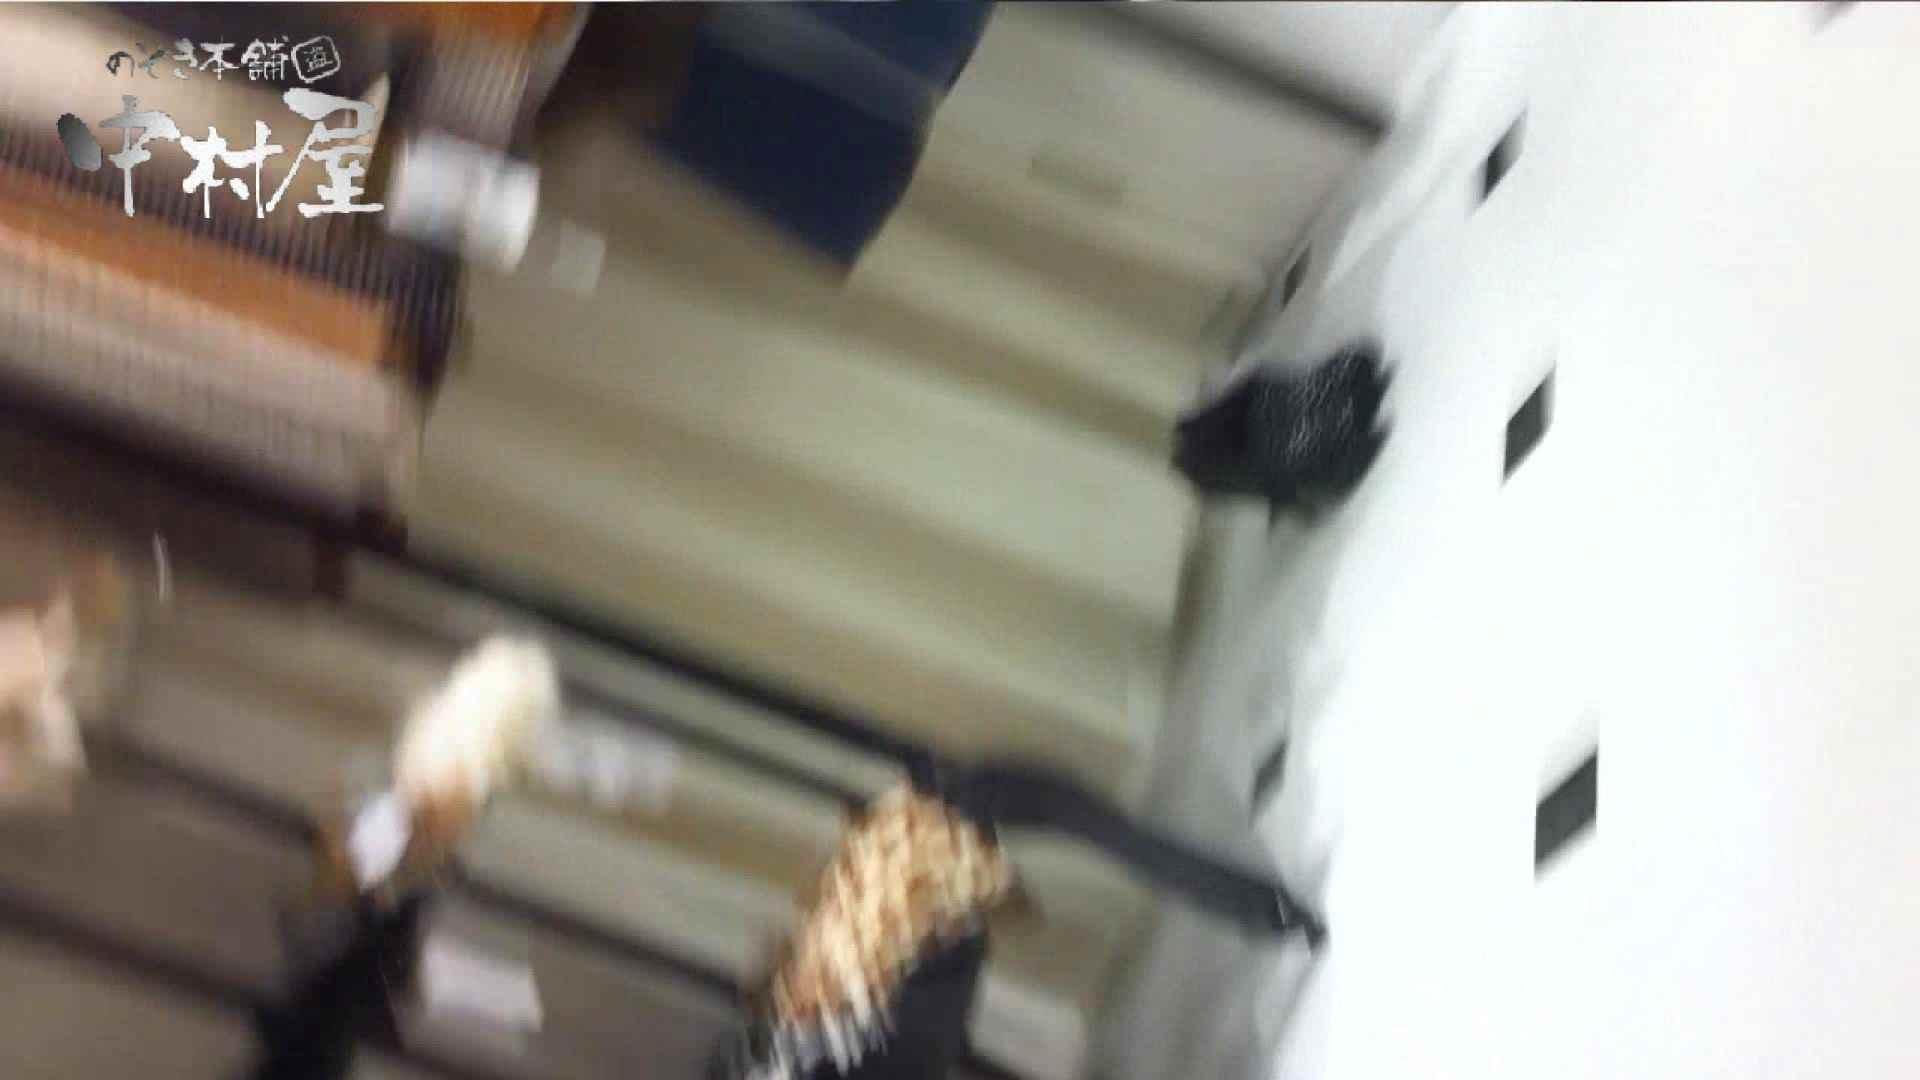 vol.48可愛いカリスマ店員胸チラ&パンチラ アニメ声の店員さん 胸チラ  96Pix 1